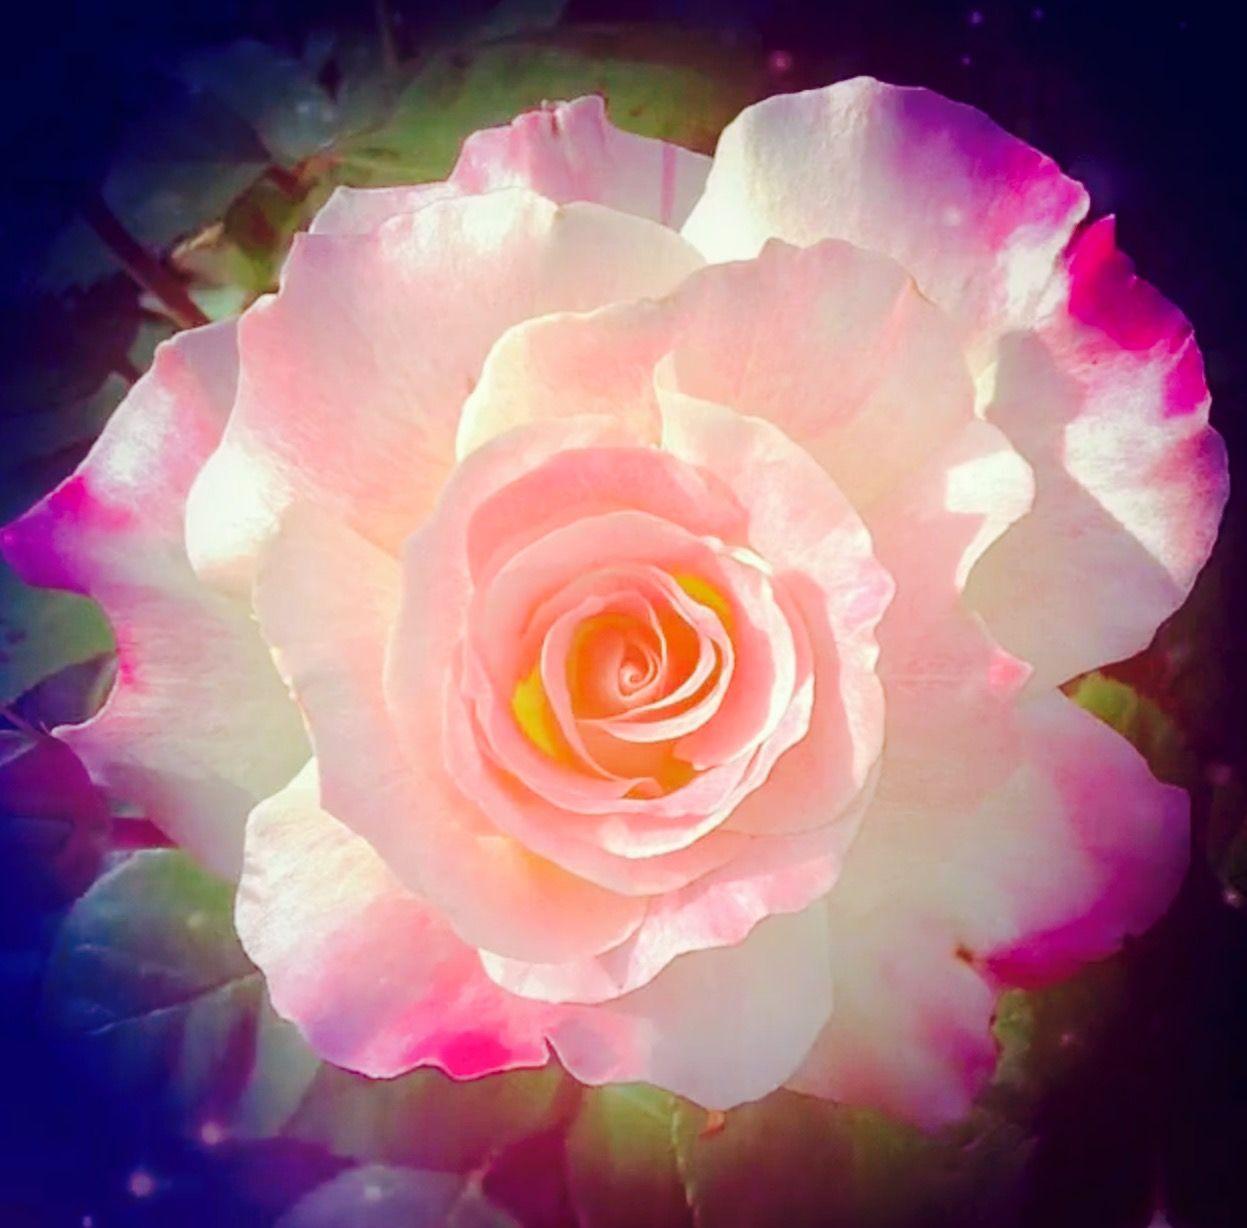 Pin By Sivaji Raju On R O S E S Wonderful Flowers Beautiful Flowers Beautiful Roses Fantastic rose flower wallpaper